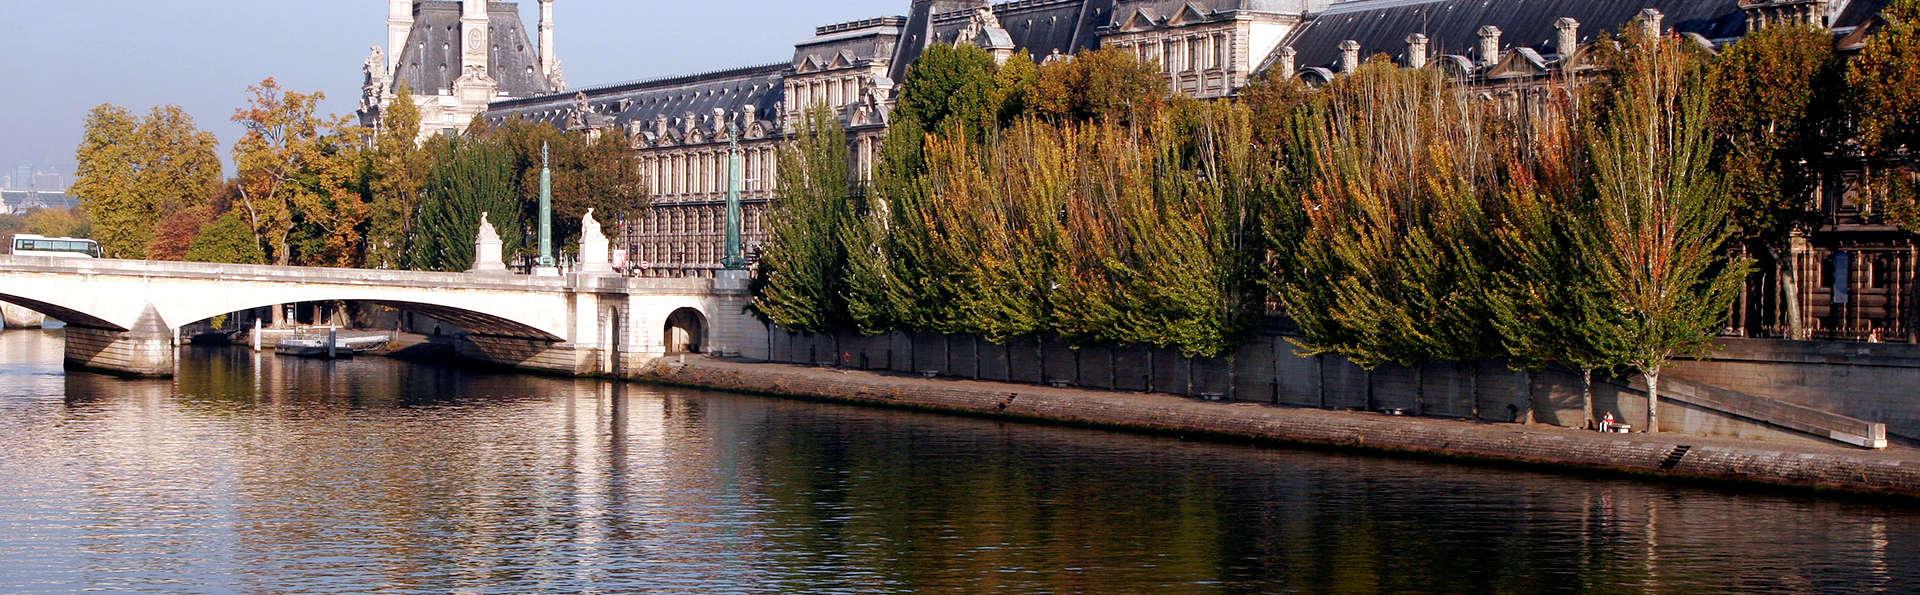 Hôtel Romance Malesherbes - Edit_Destination3.jpg